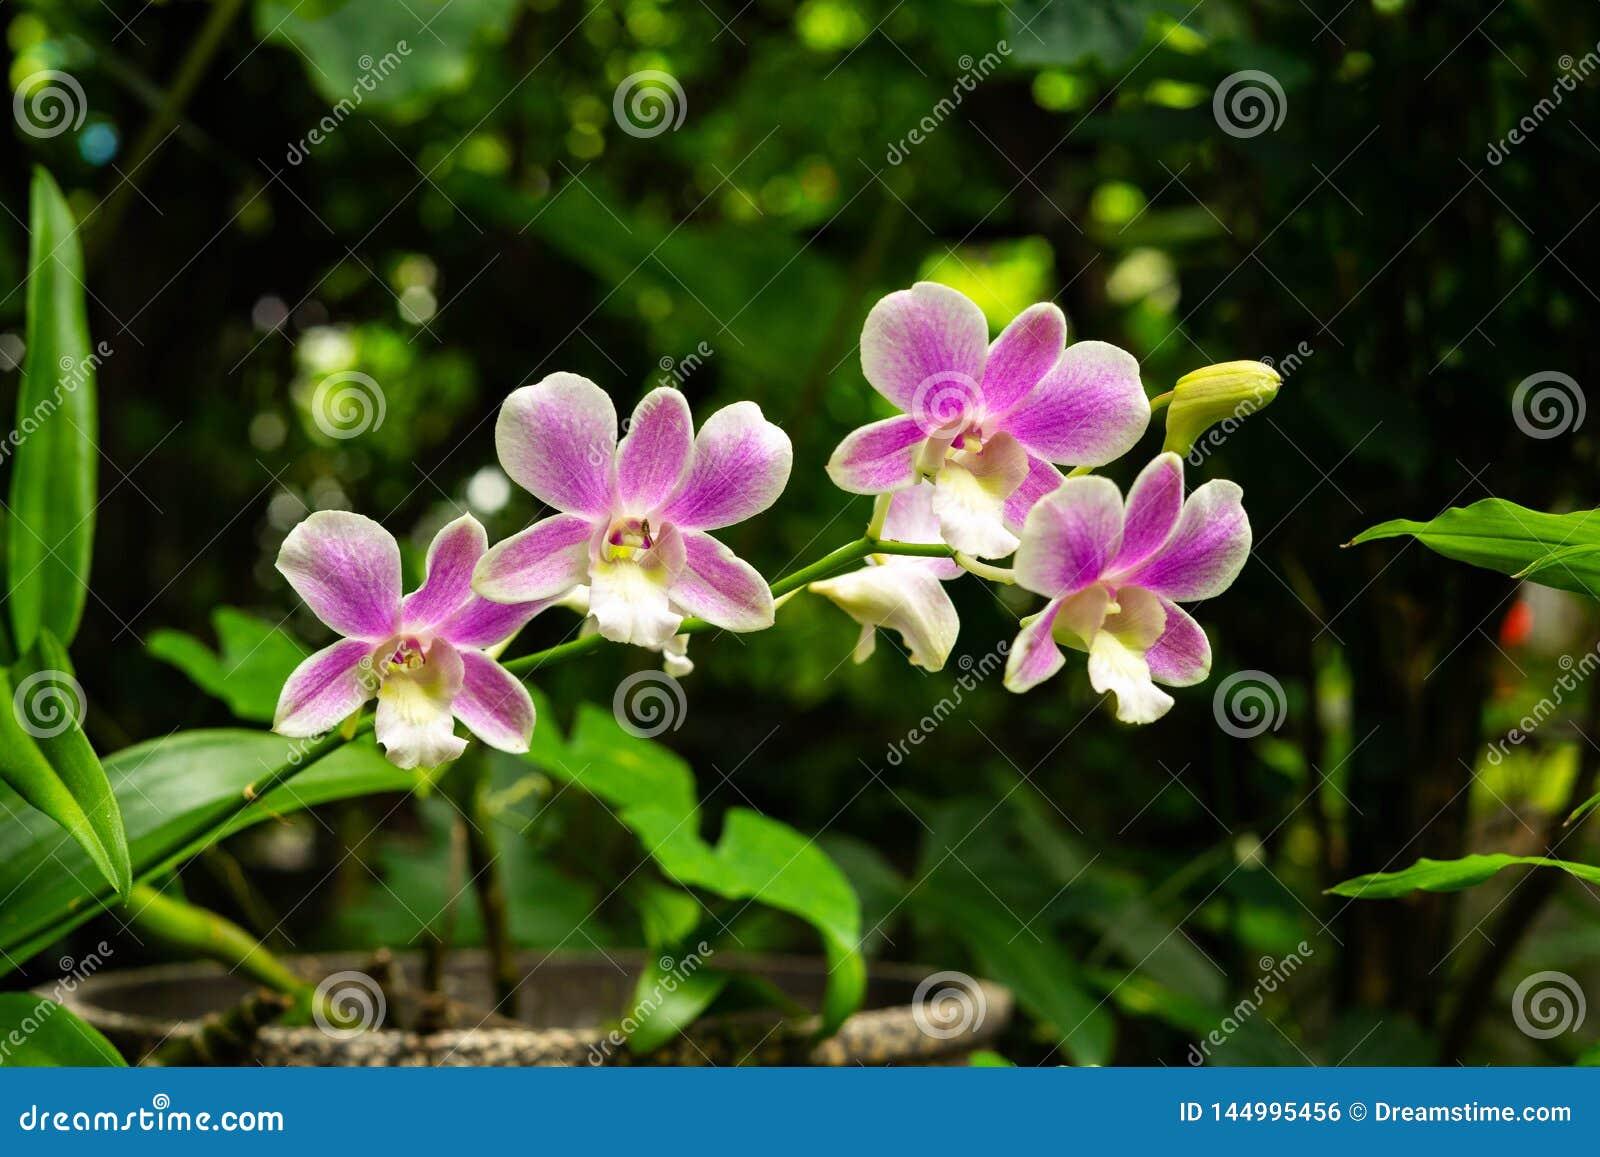 Orchidea porpora della pianta